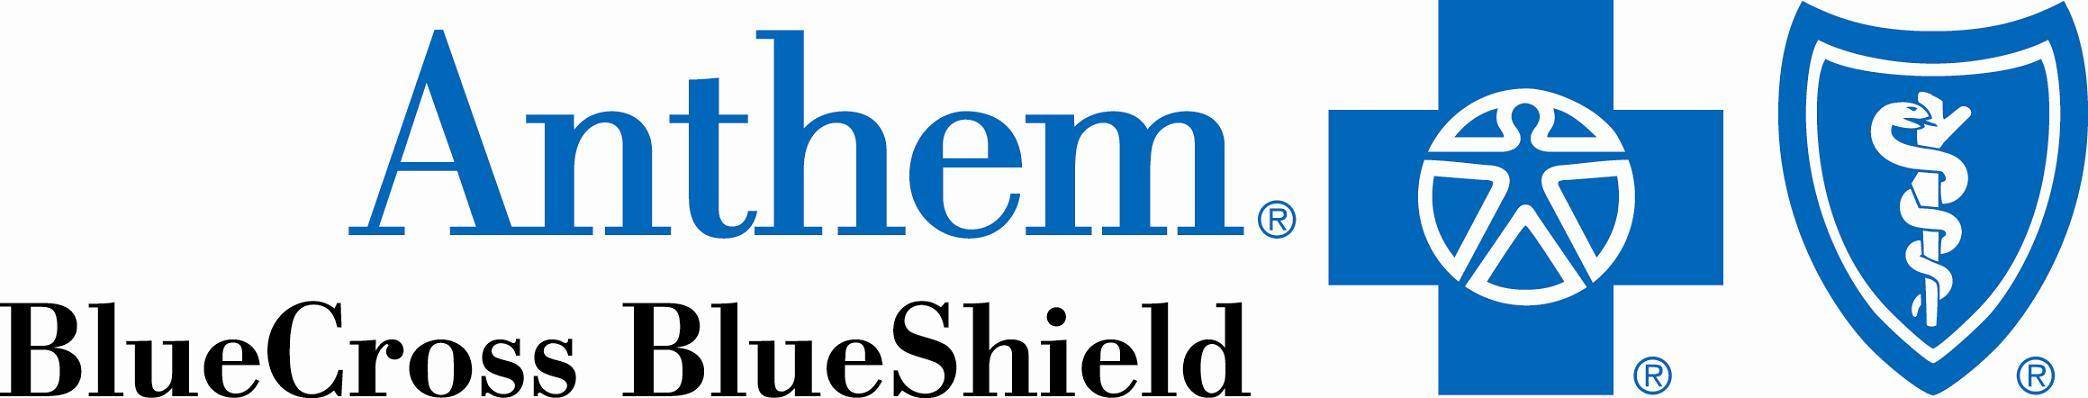 anthem_blue_cross_and_blue_shield-run_mdi-sponsor.jpg